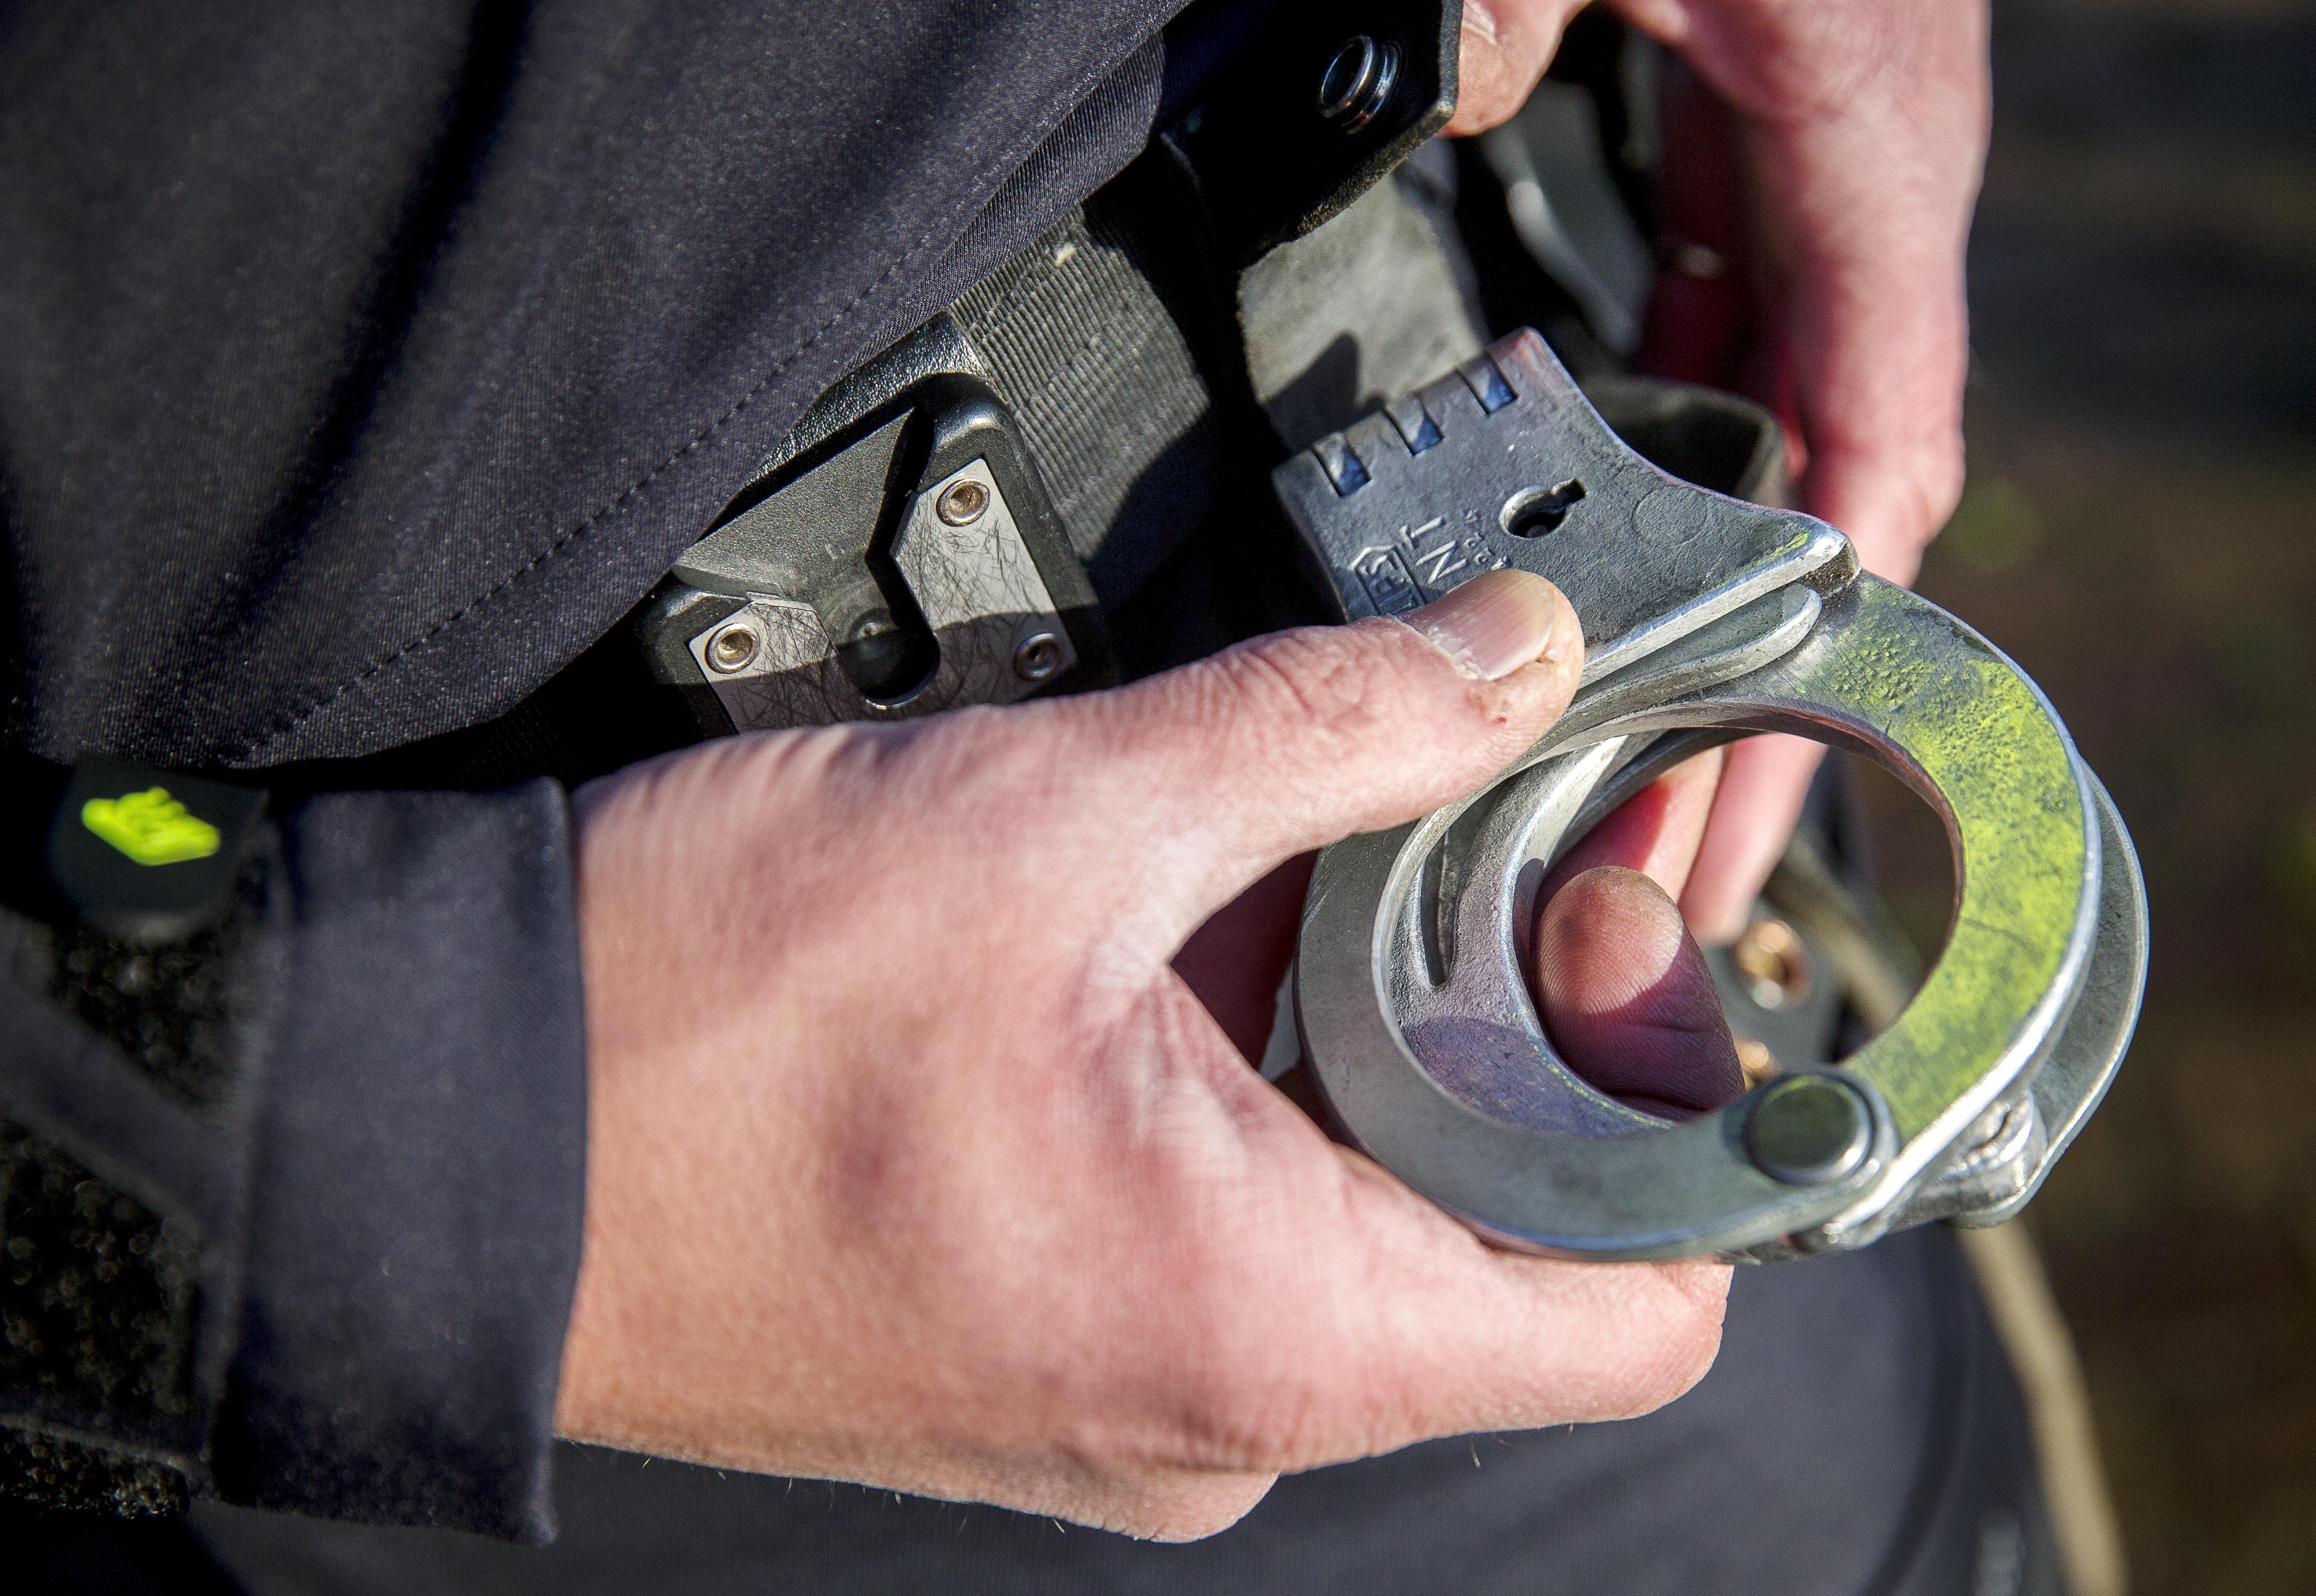 Hoornse tieners aangehouden na straatroof en mishandeling in Wognum